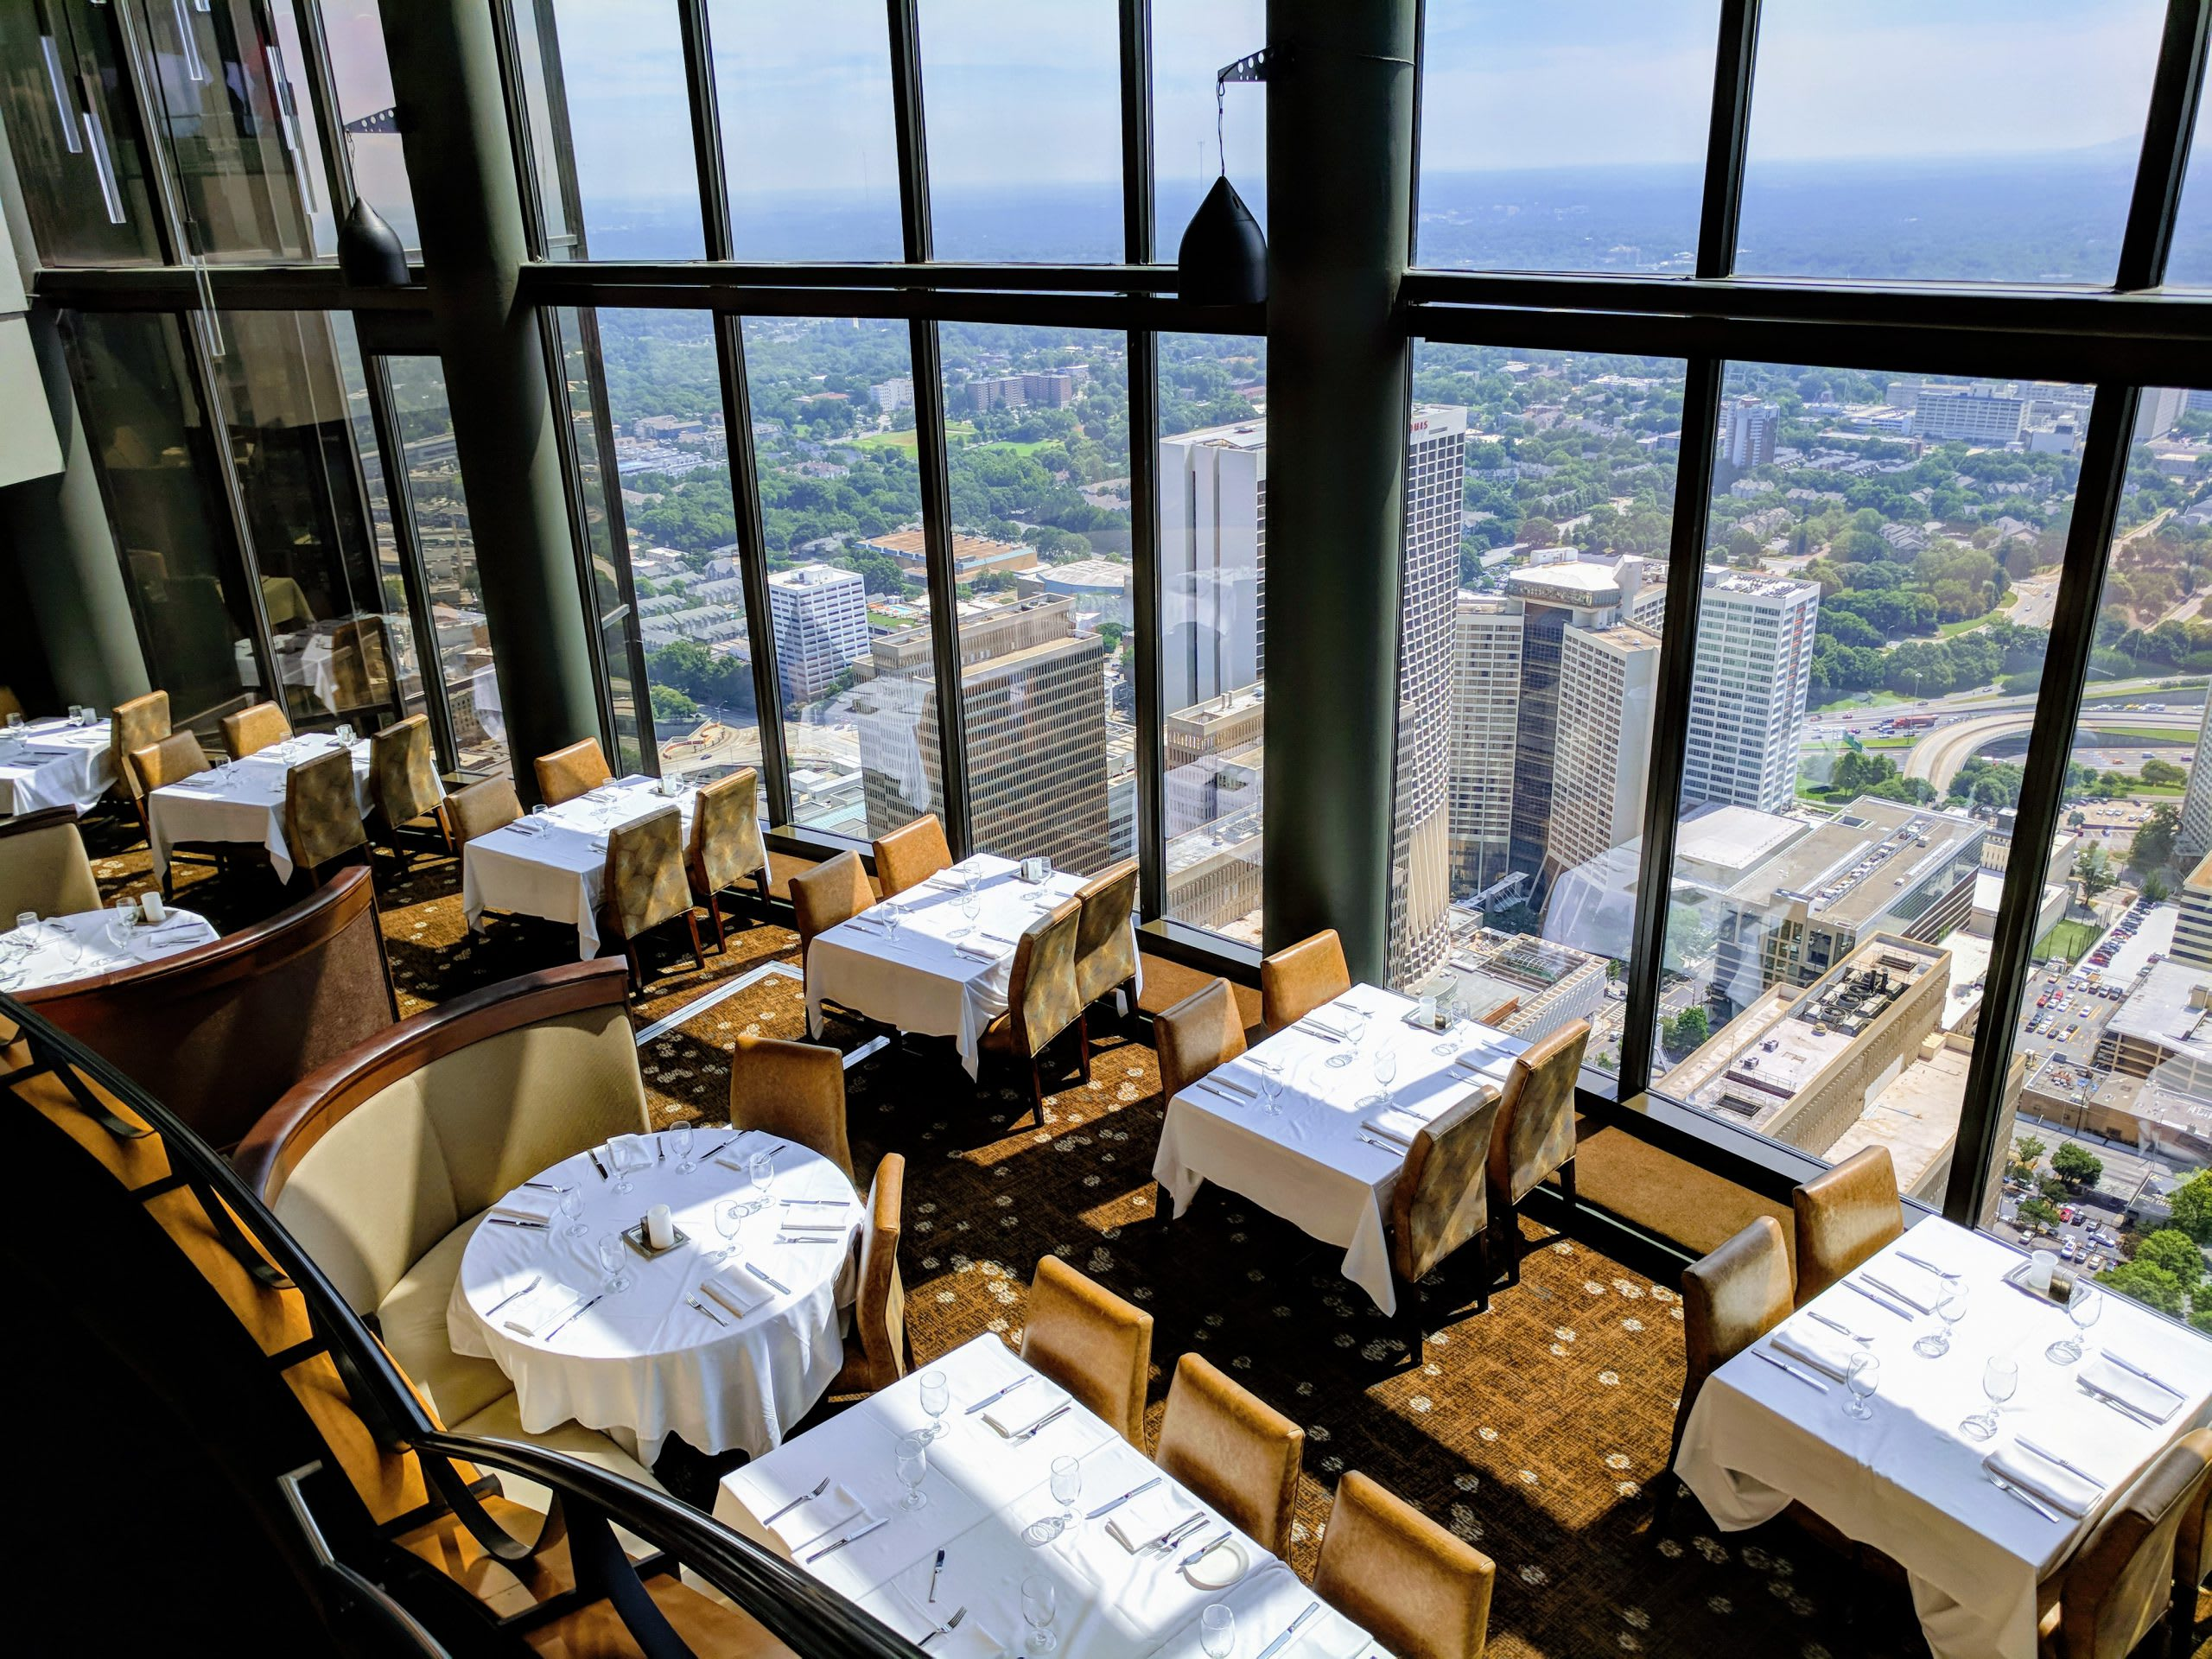 Sun Dial Restaurant, Bar & View